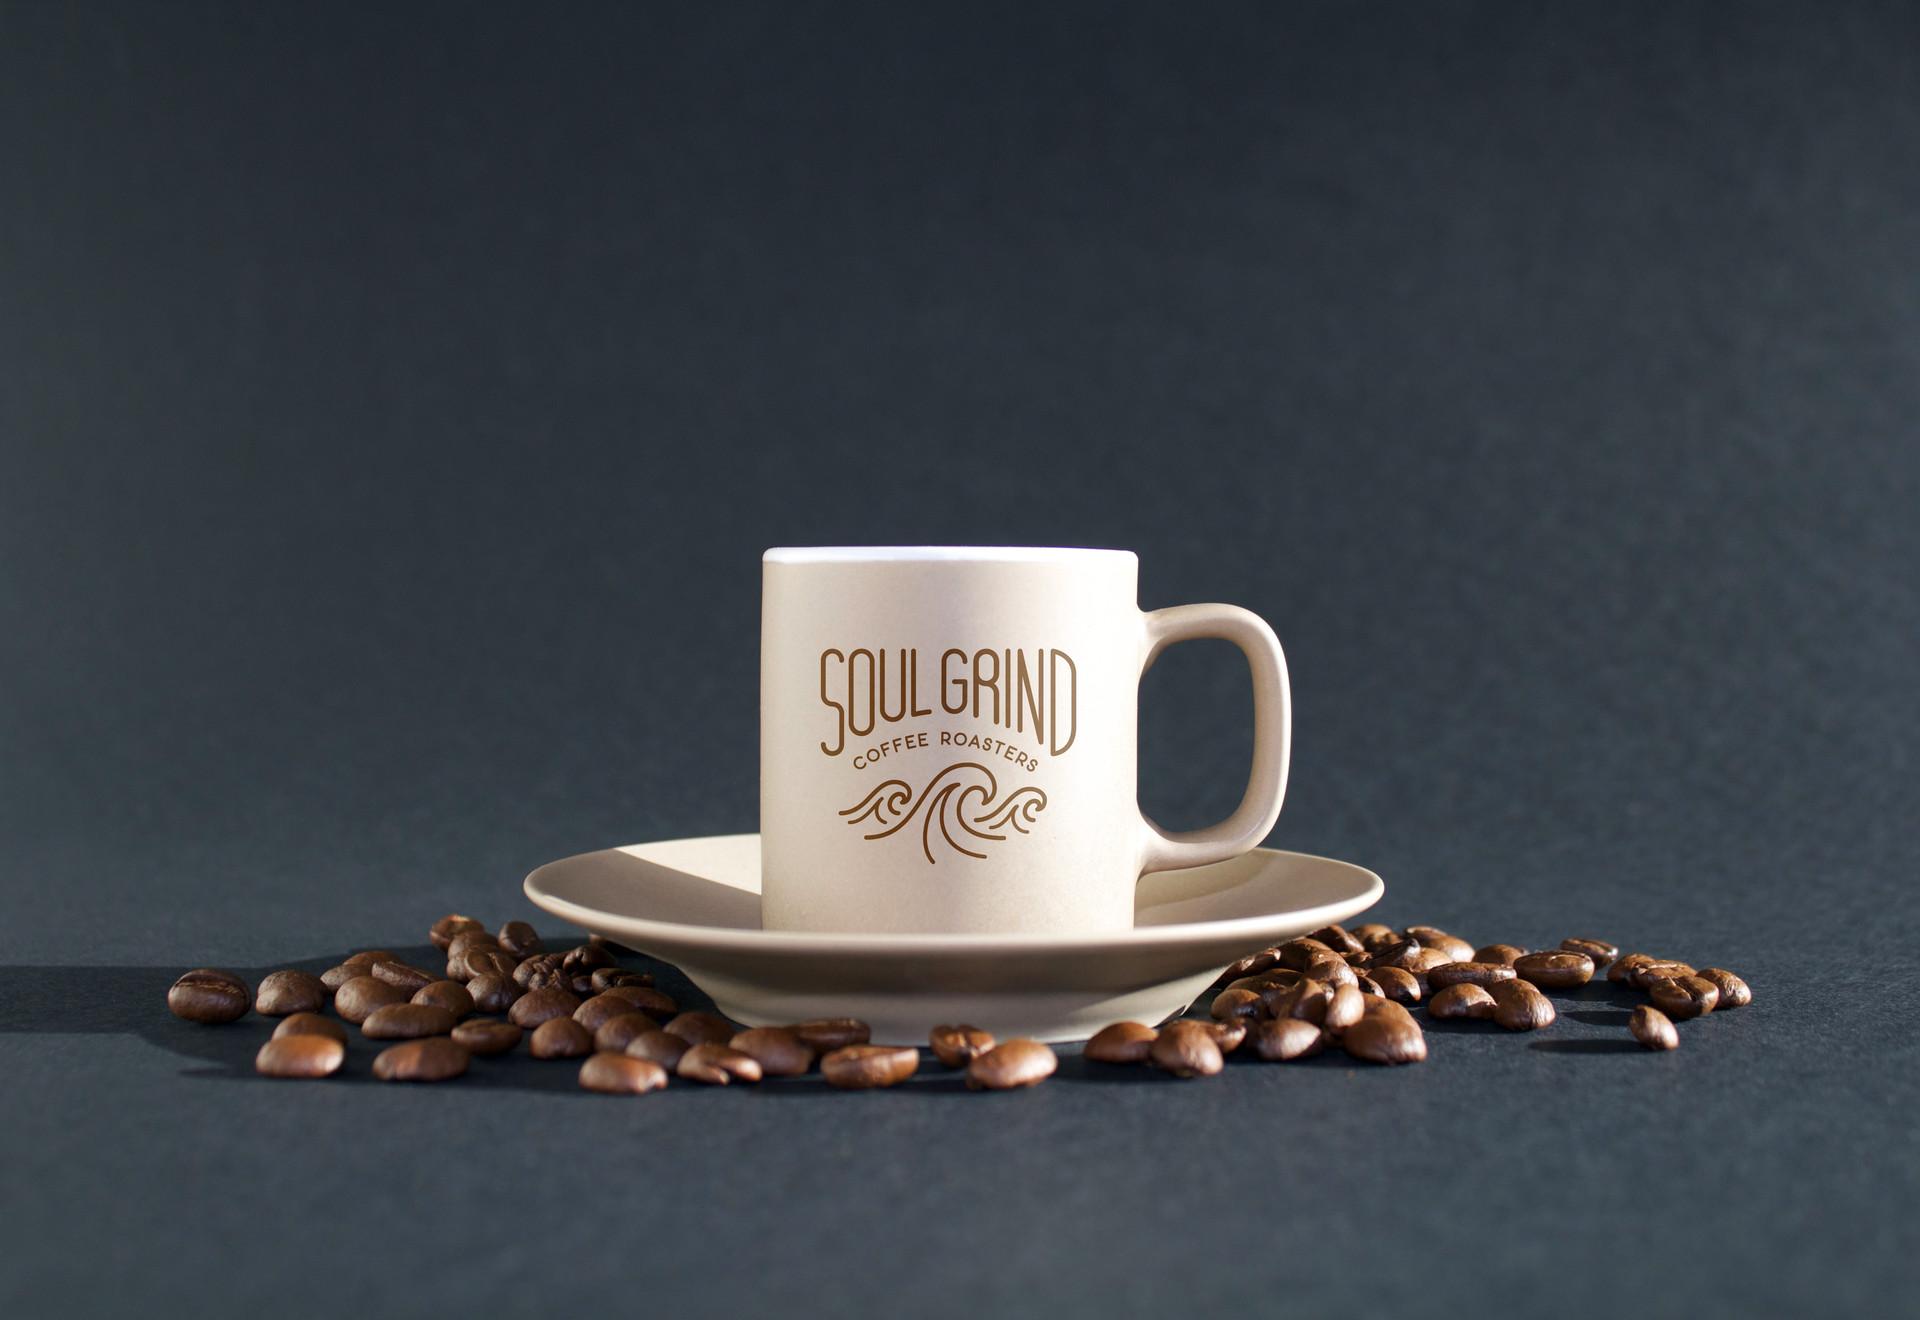 SoulGrind-mug-mockup.jpg